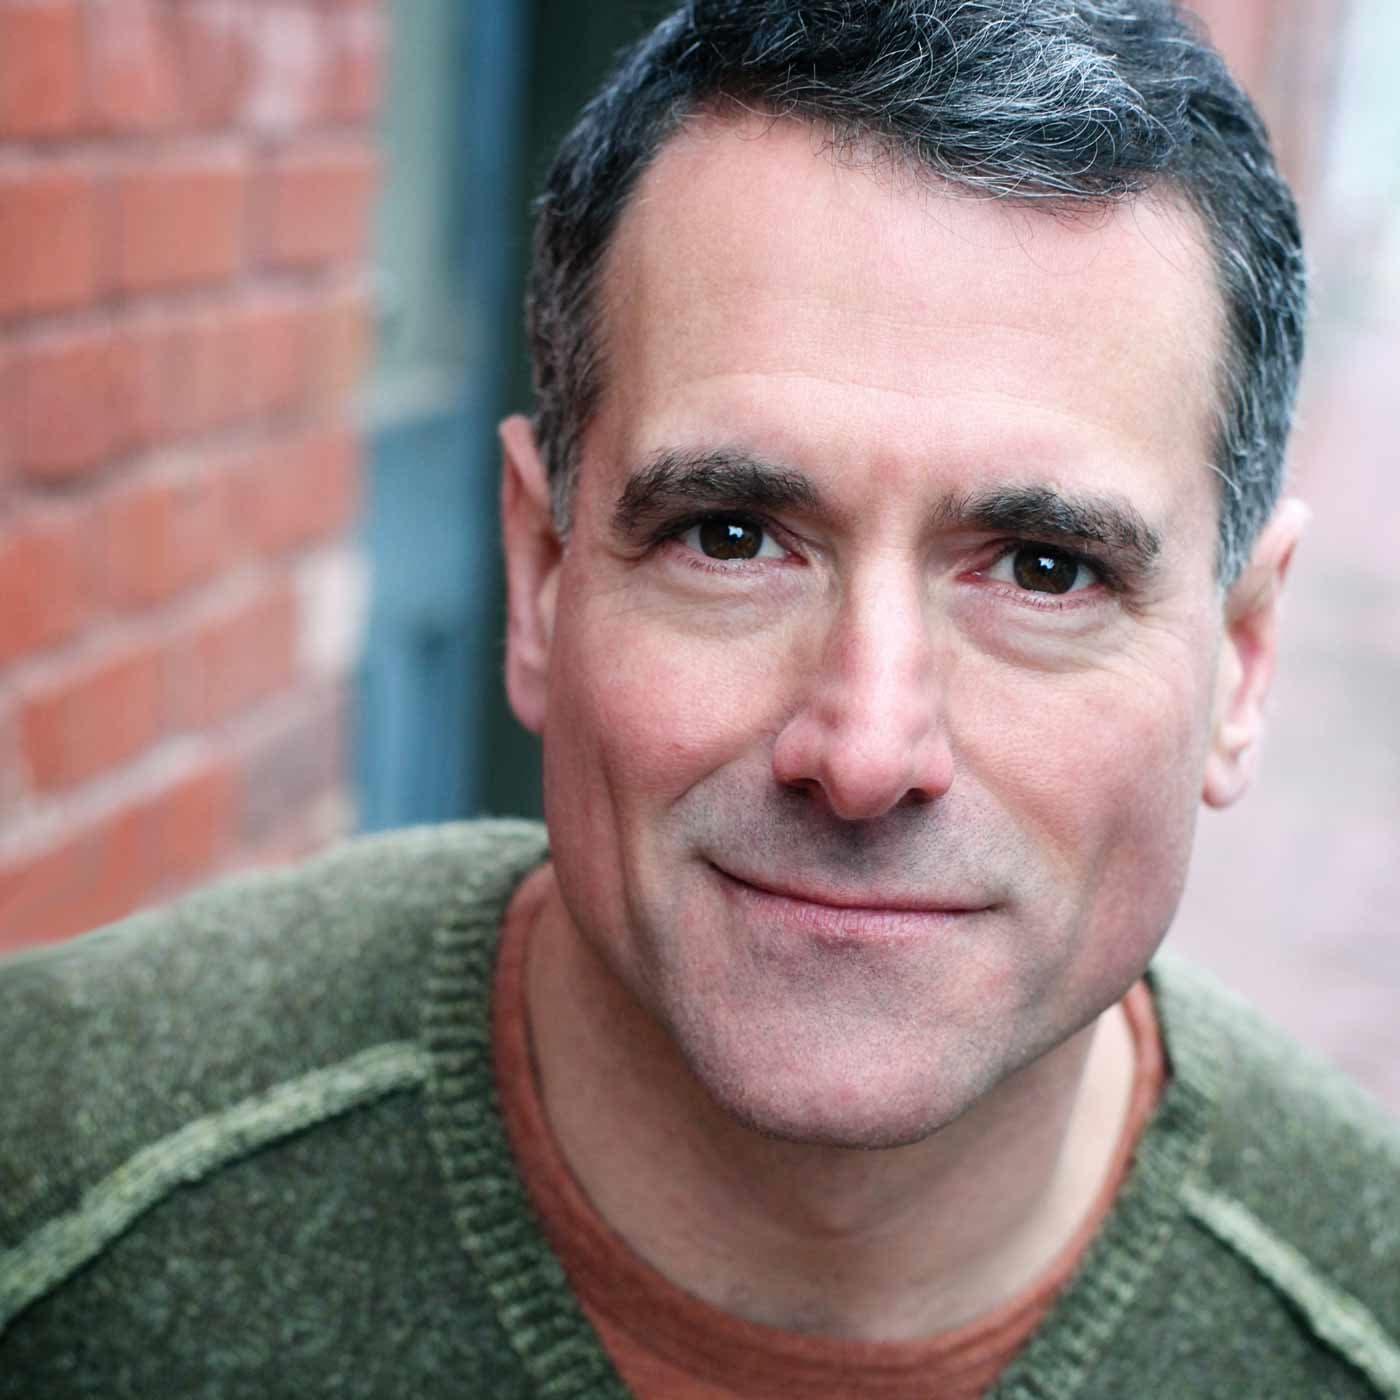 Stephen Skybell